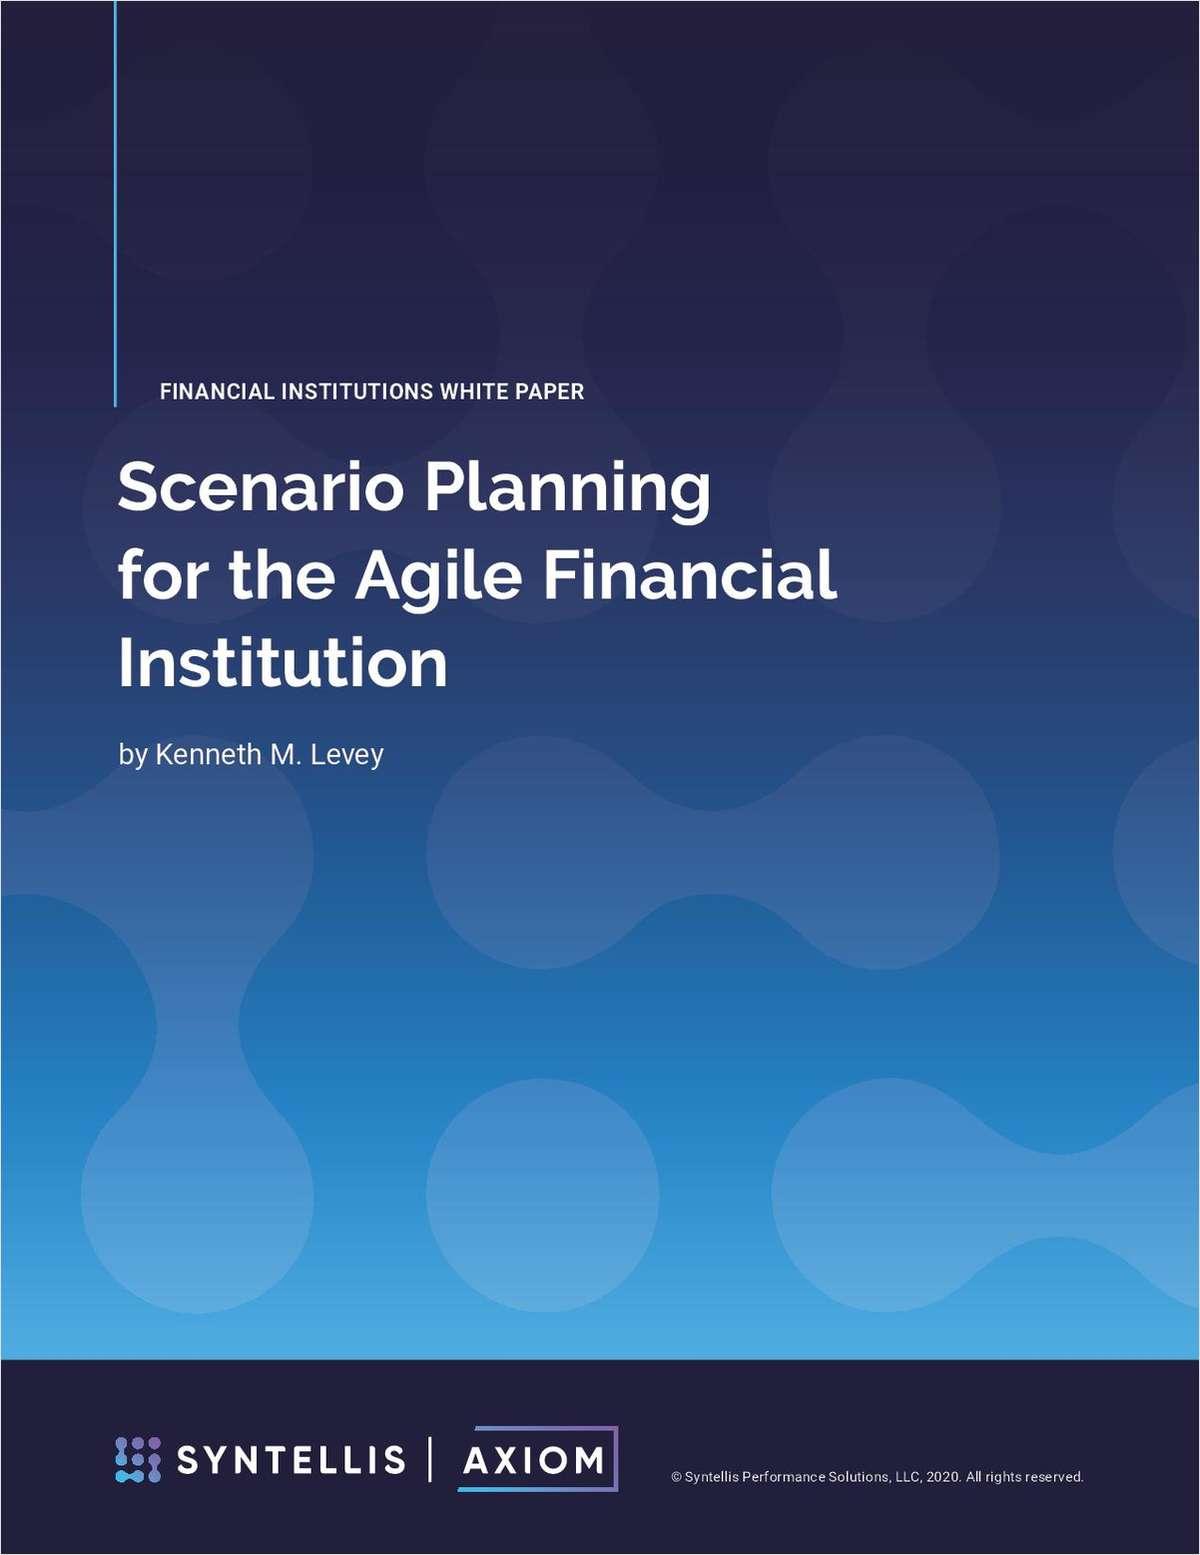 Scenario Planning for the Agile Financial Institution